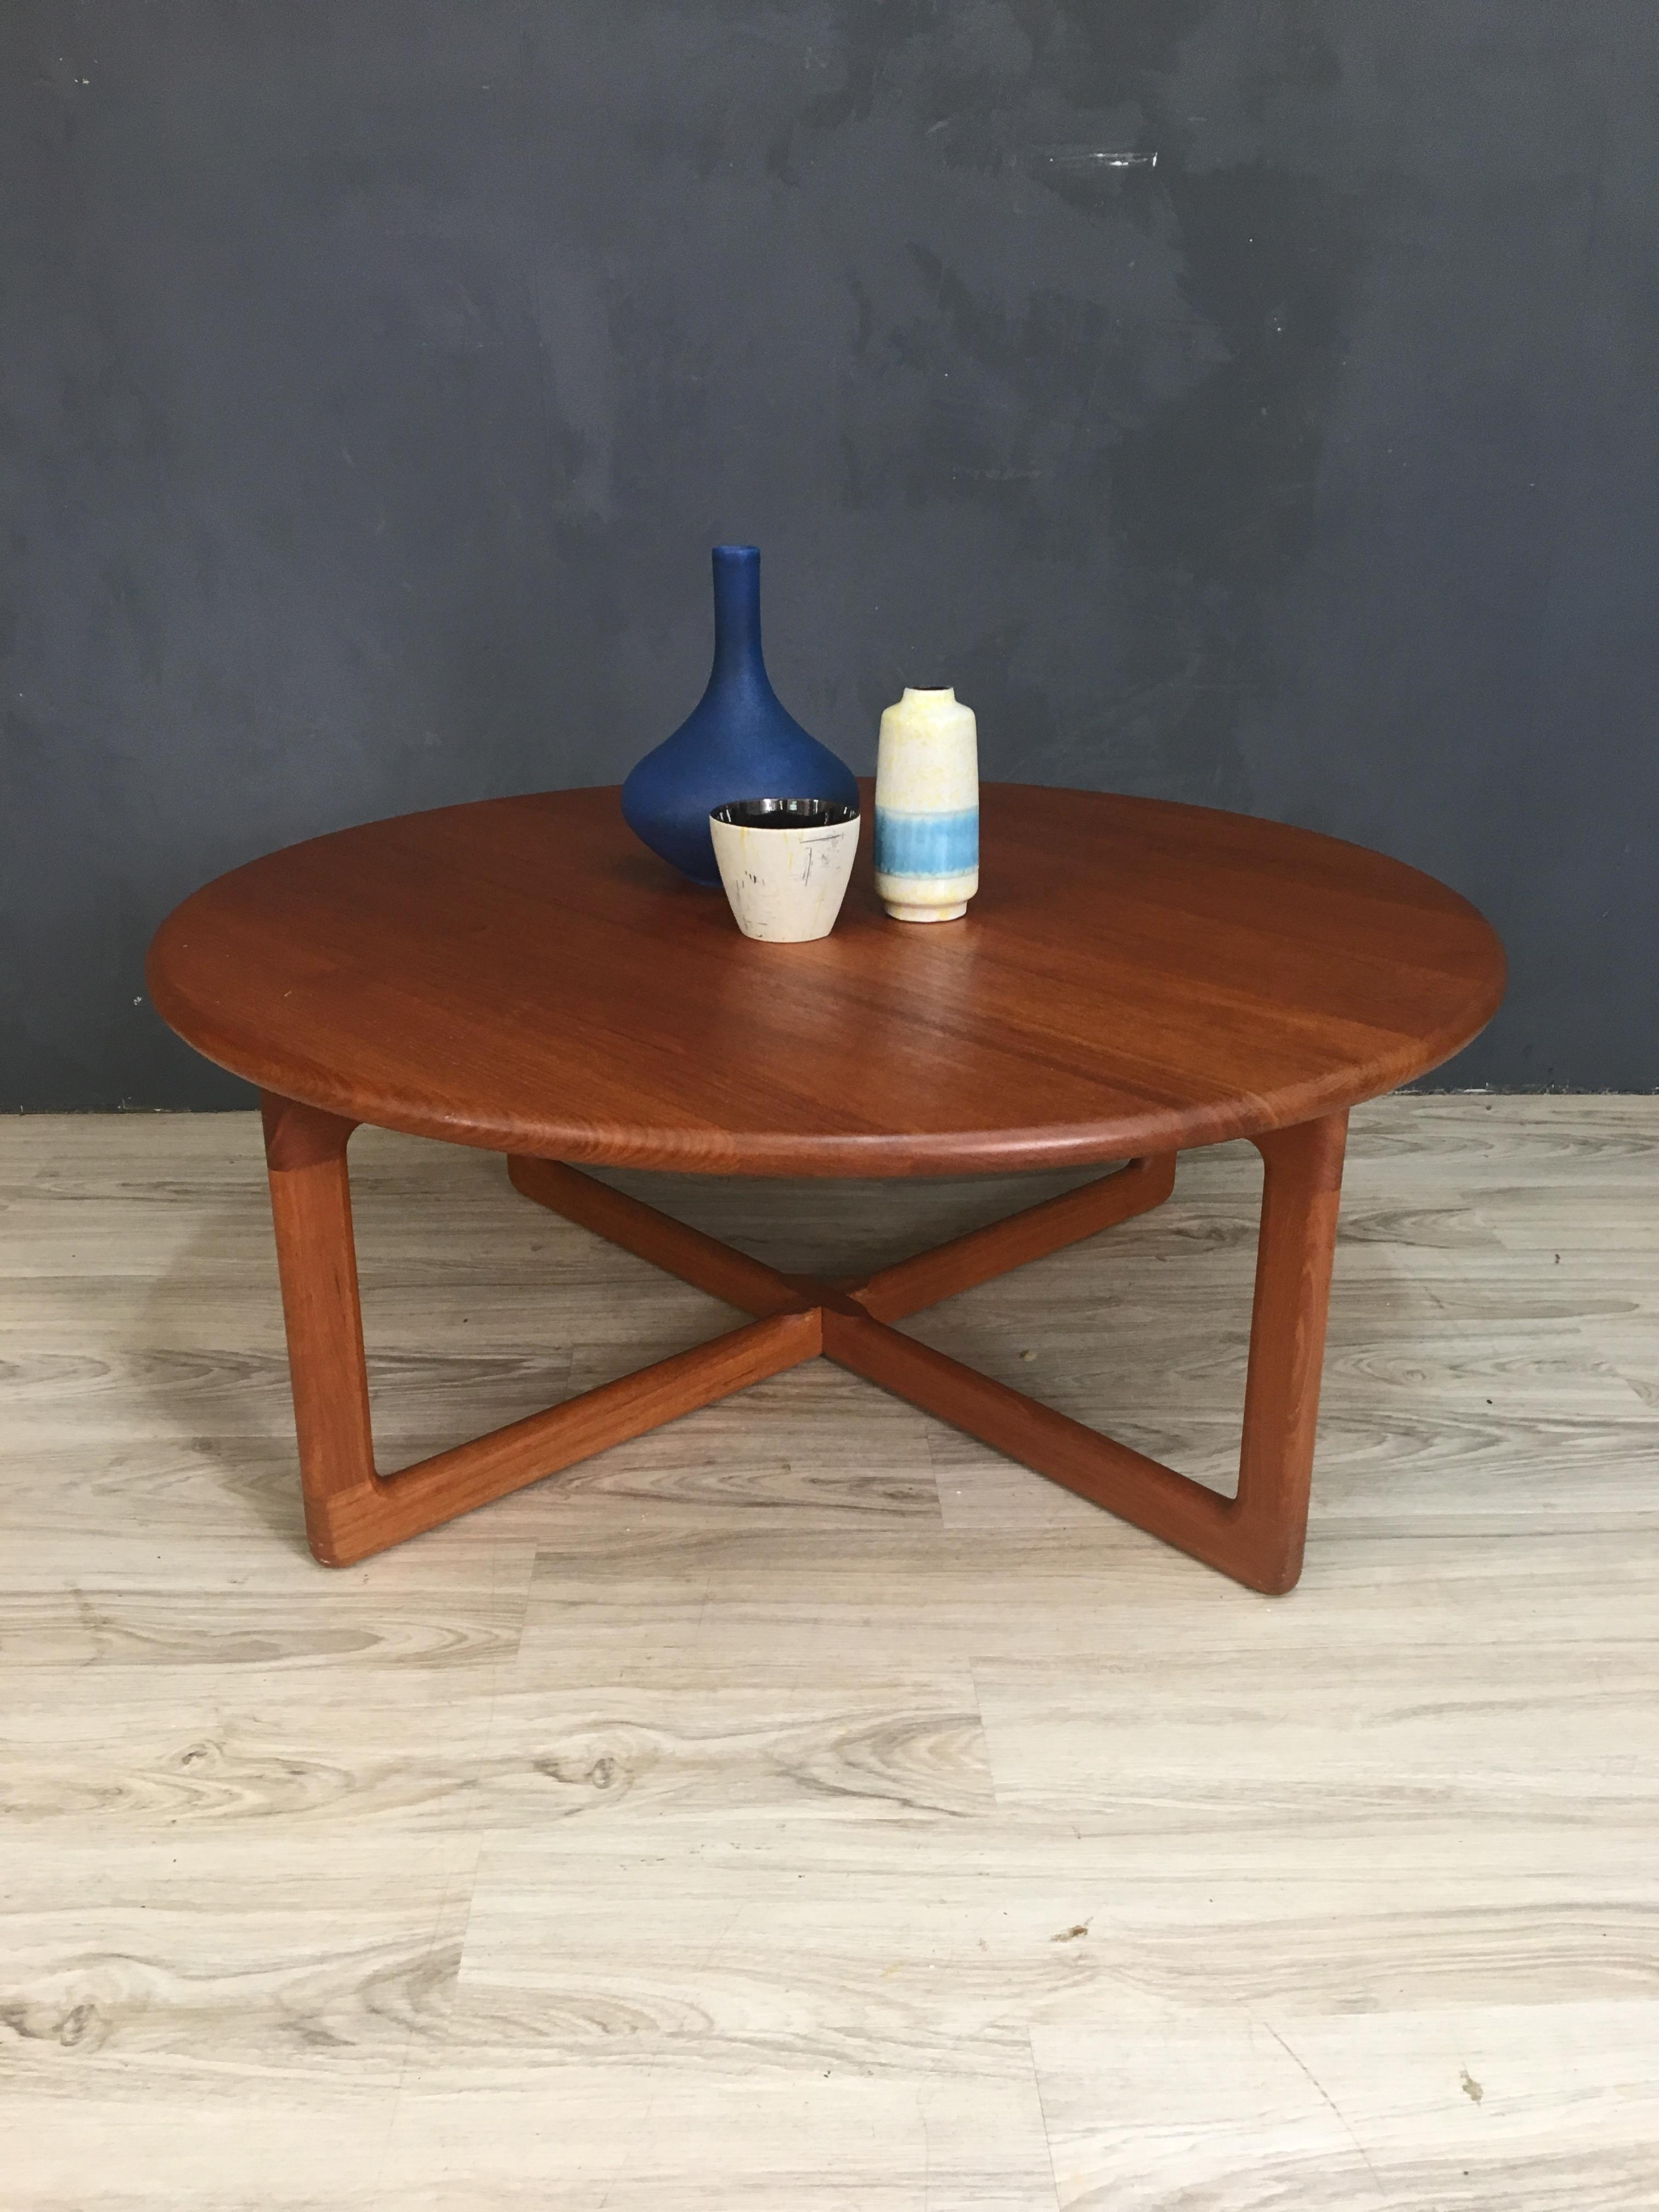 Danish Modern Round Teak Coffee Table – Retrocraft Design Throughout Famous Round Teak Coffee Tables (View 4 of 20)